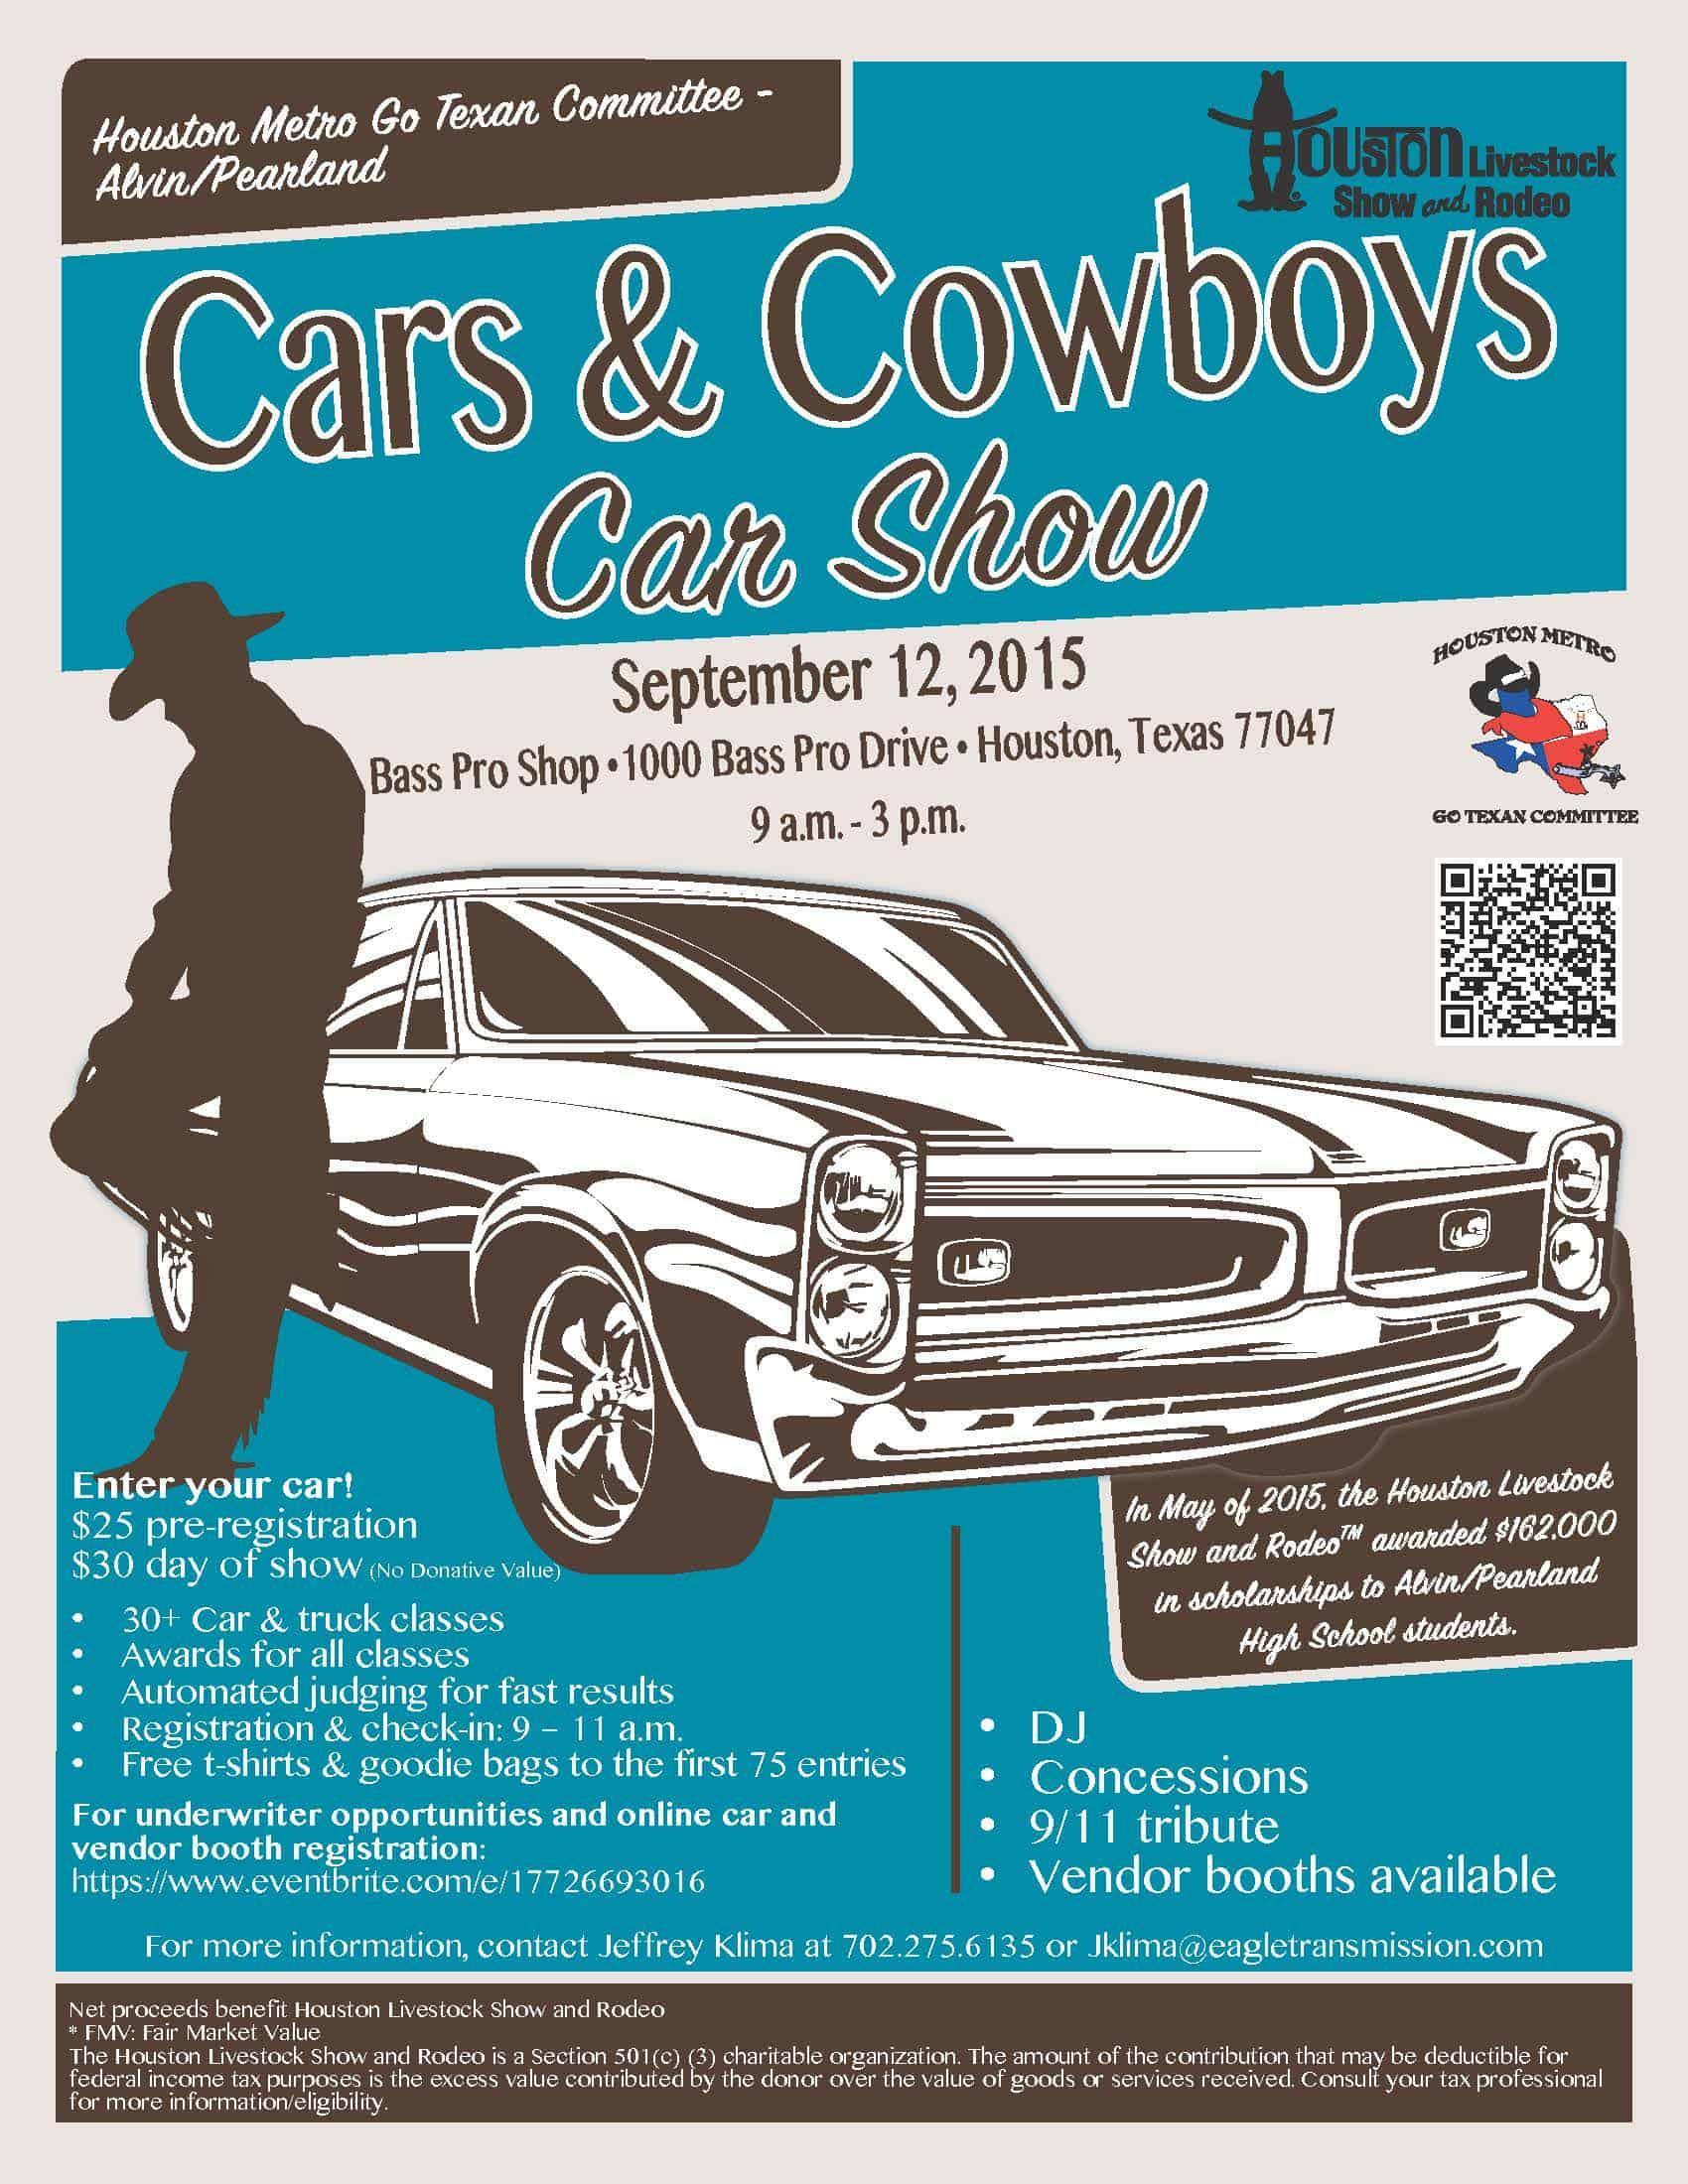 Register car online texas - Alvin Pearland Cars Cowboys Car Show Revs Up September 12